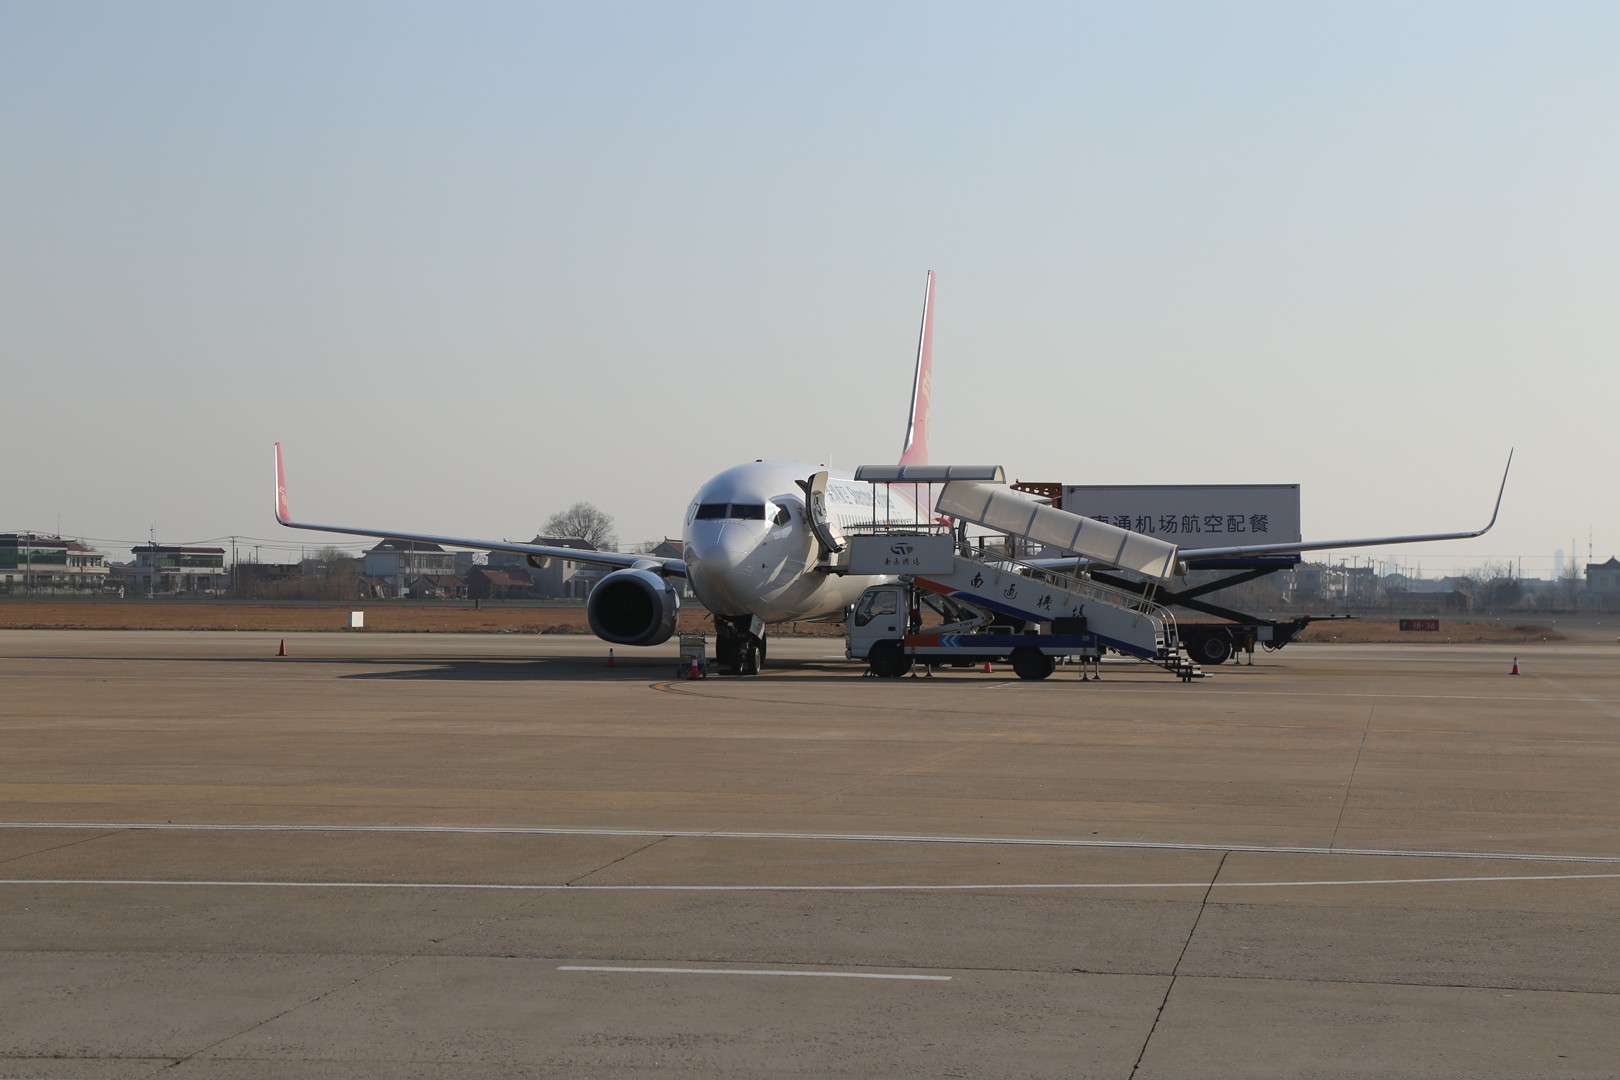 Re:[原创]白云之城——广州行记(南通兴东ZSNT/NTG—广州白云ZGGG/CAN—上海虹桥ZSSS/SHA) BOEING 737-800 B-5413 中国南通兴东机场